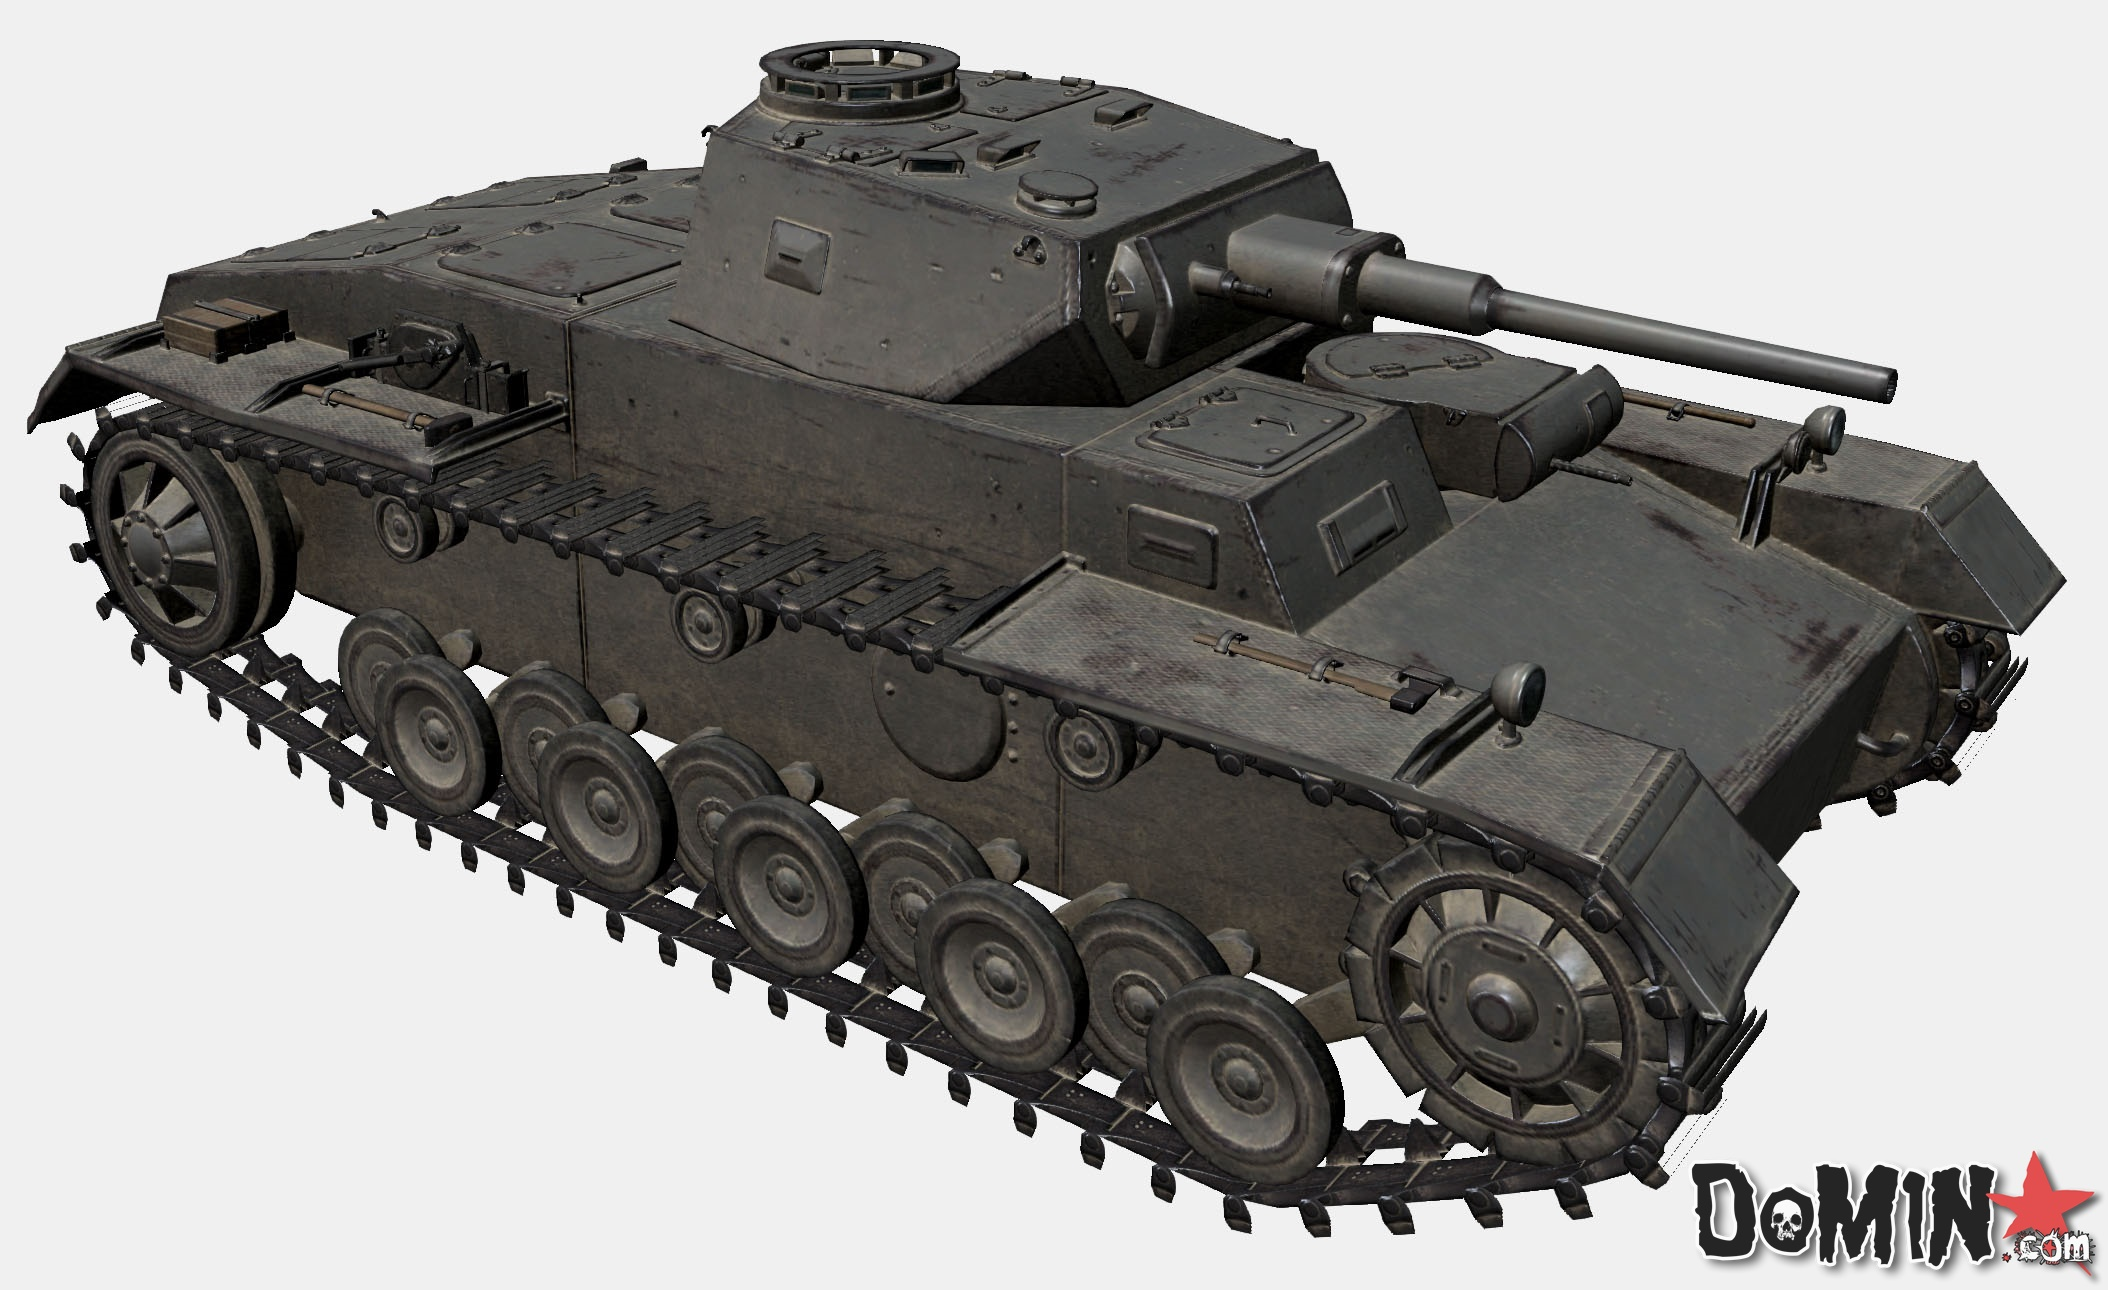 Vk655